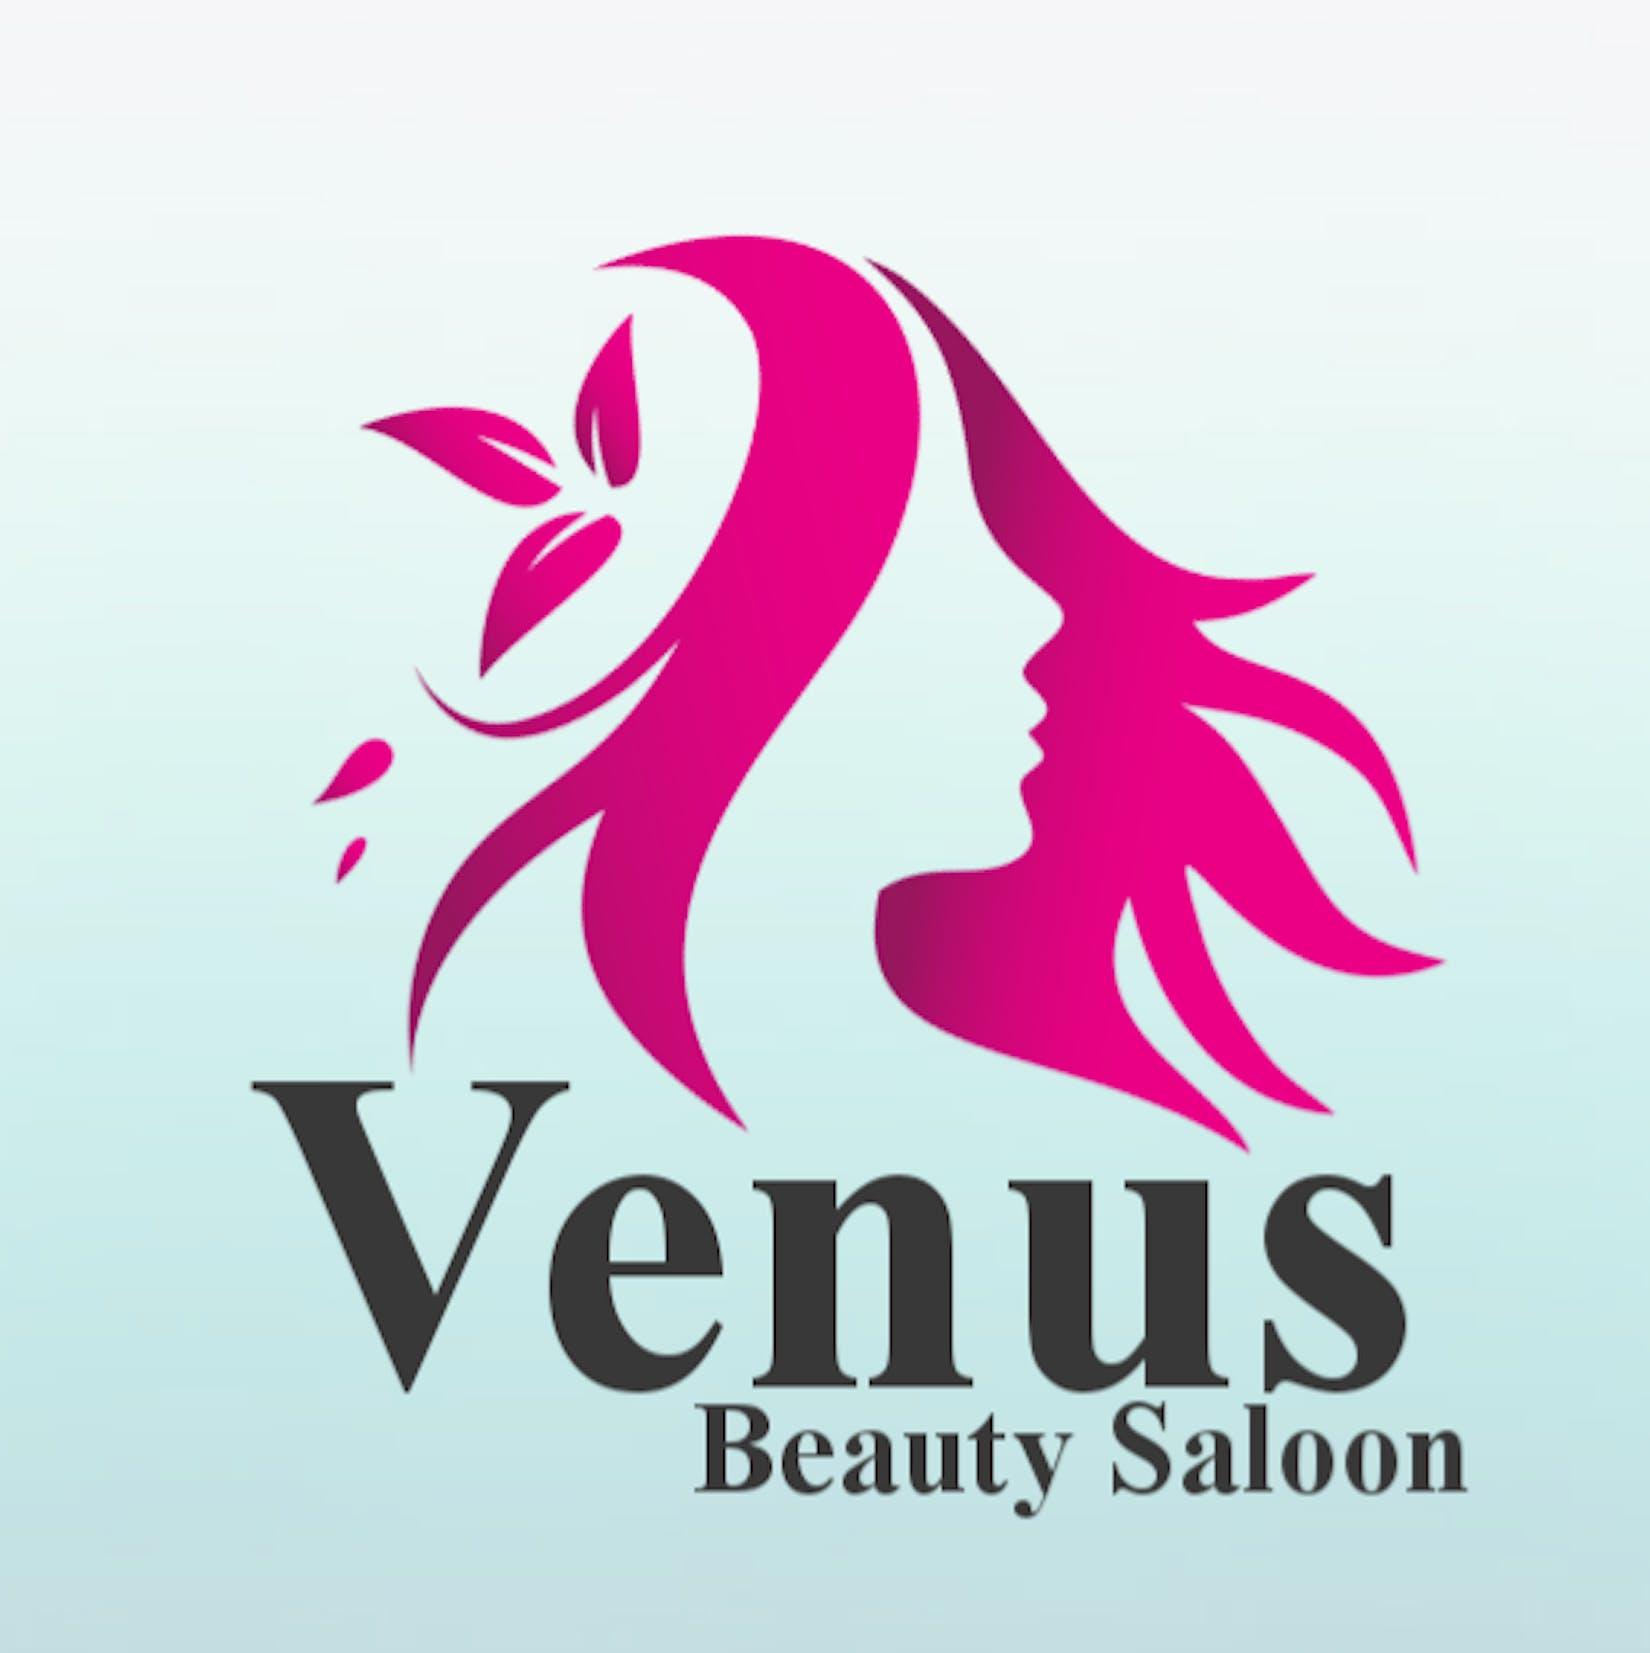 Venus Beauty Salon | Beauty